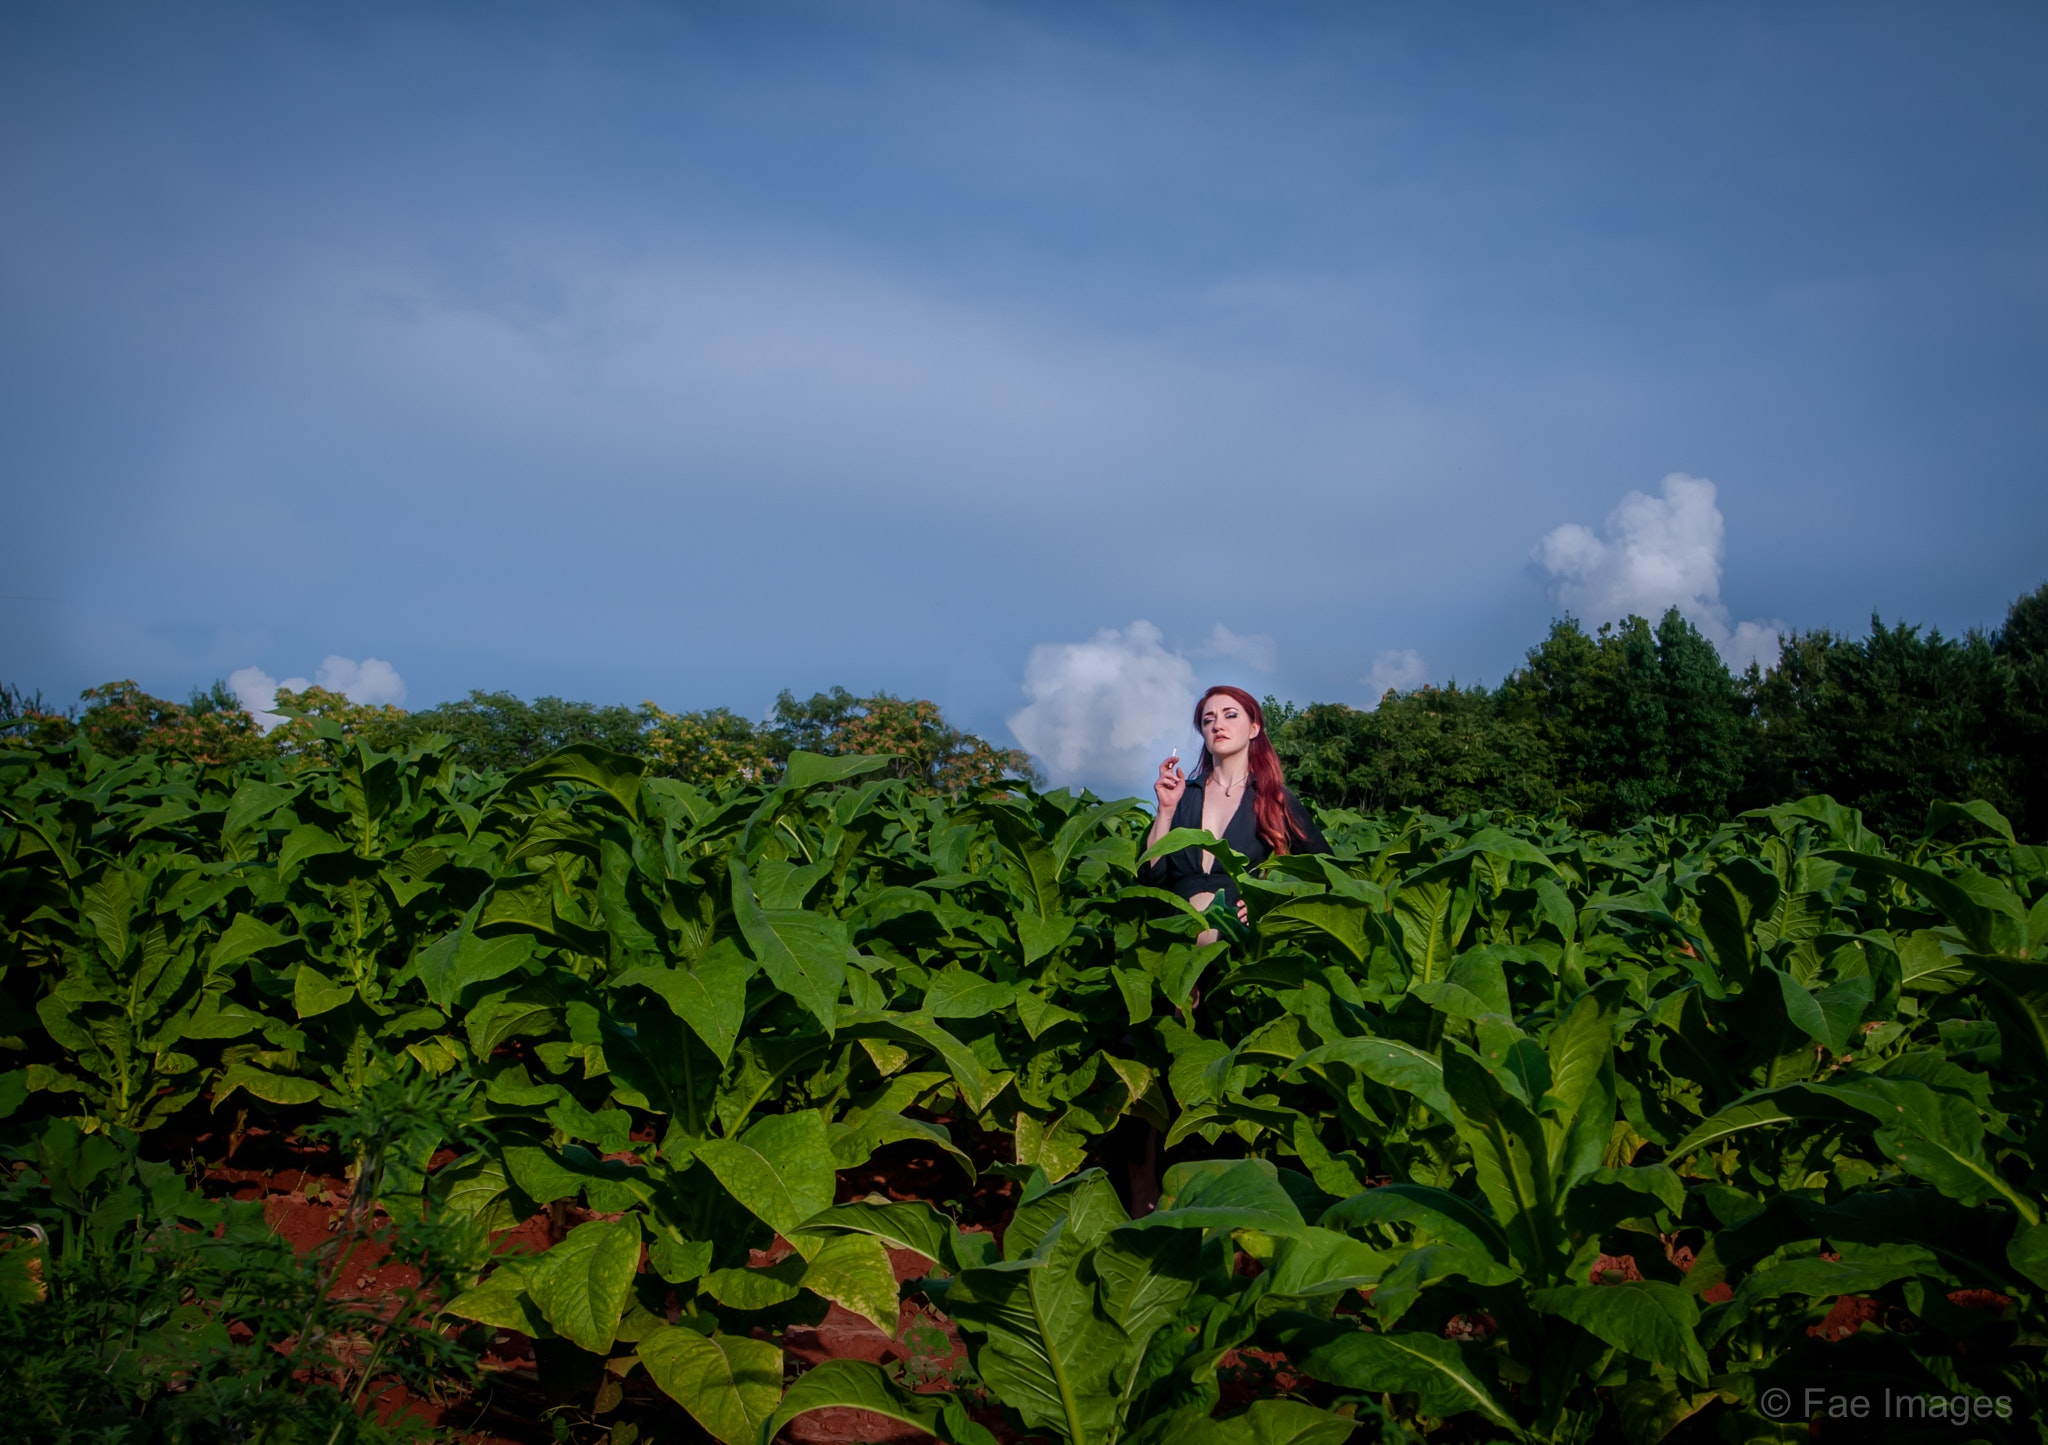 Fae Images - Susan-tobacco-web-1